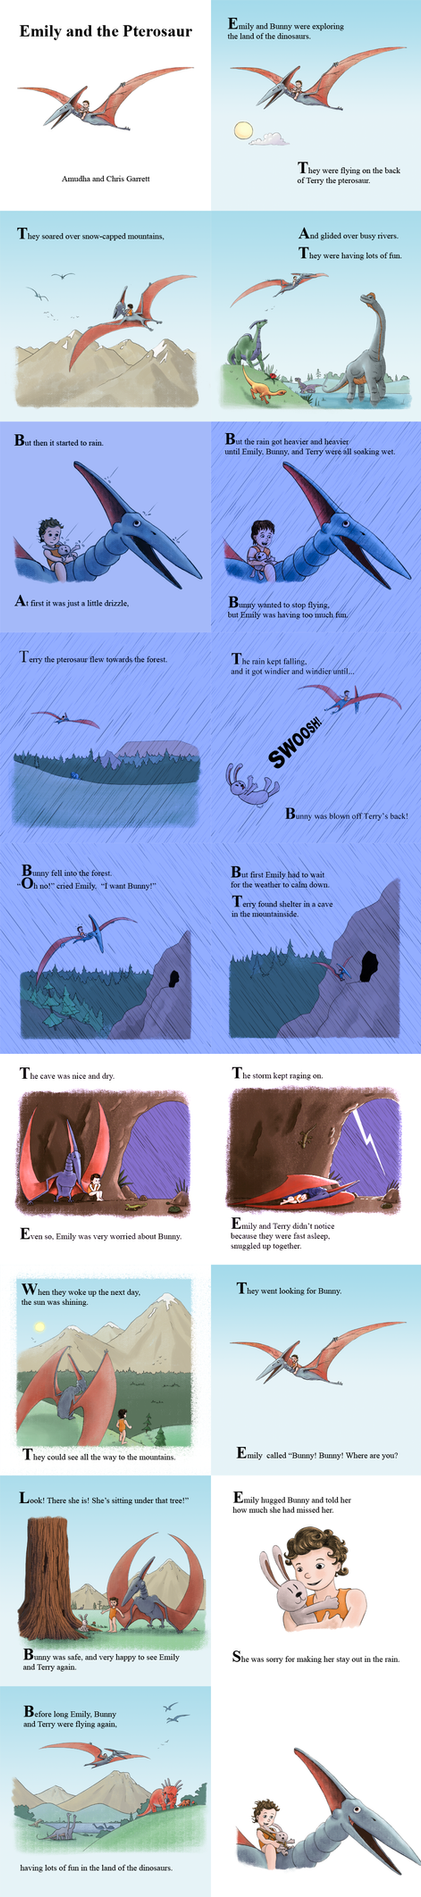 Emily and the Pterosaur by Chris-Garrett